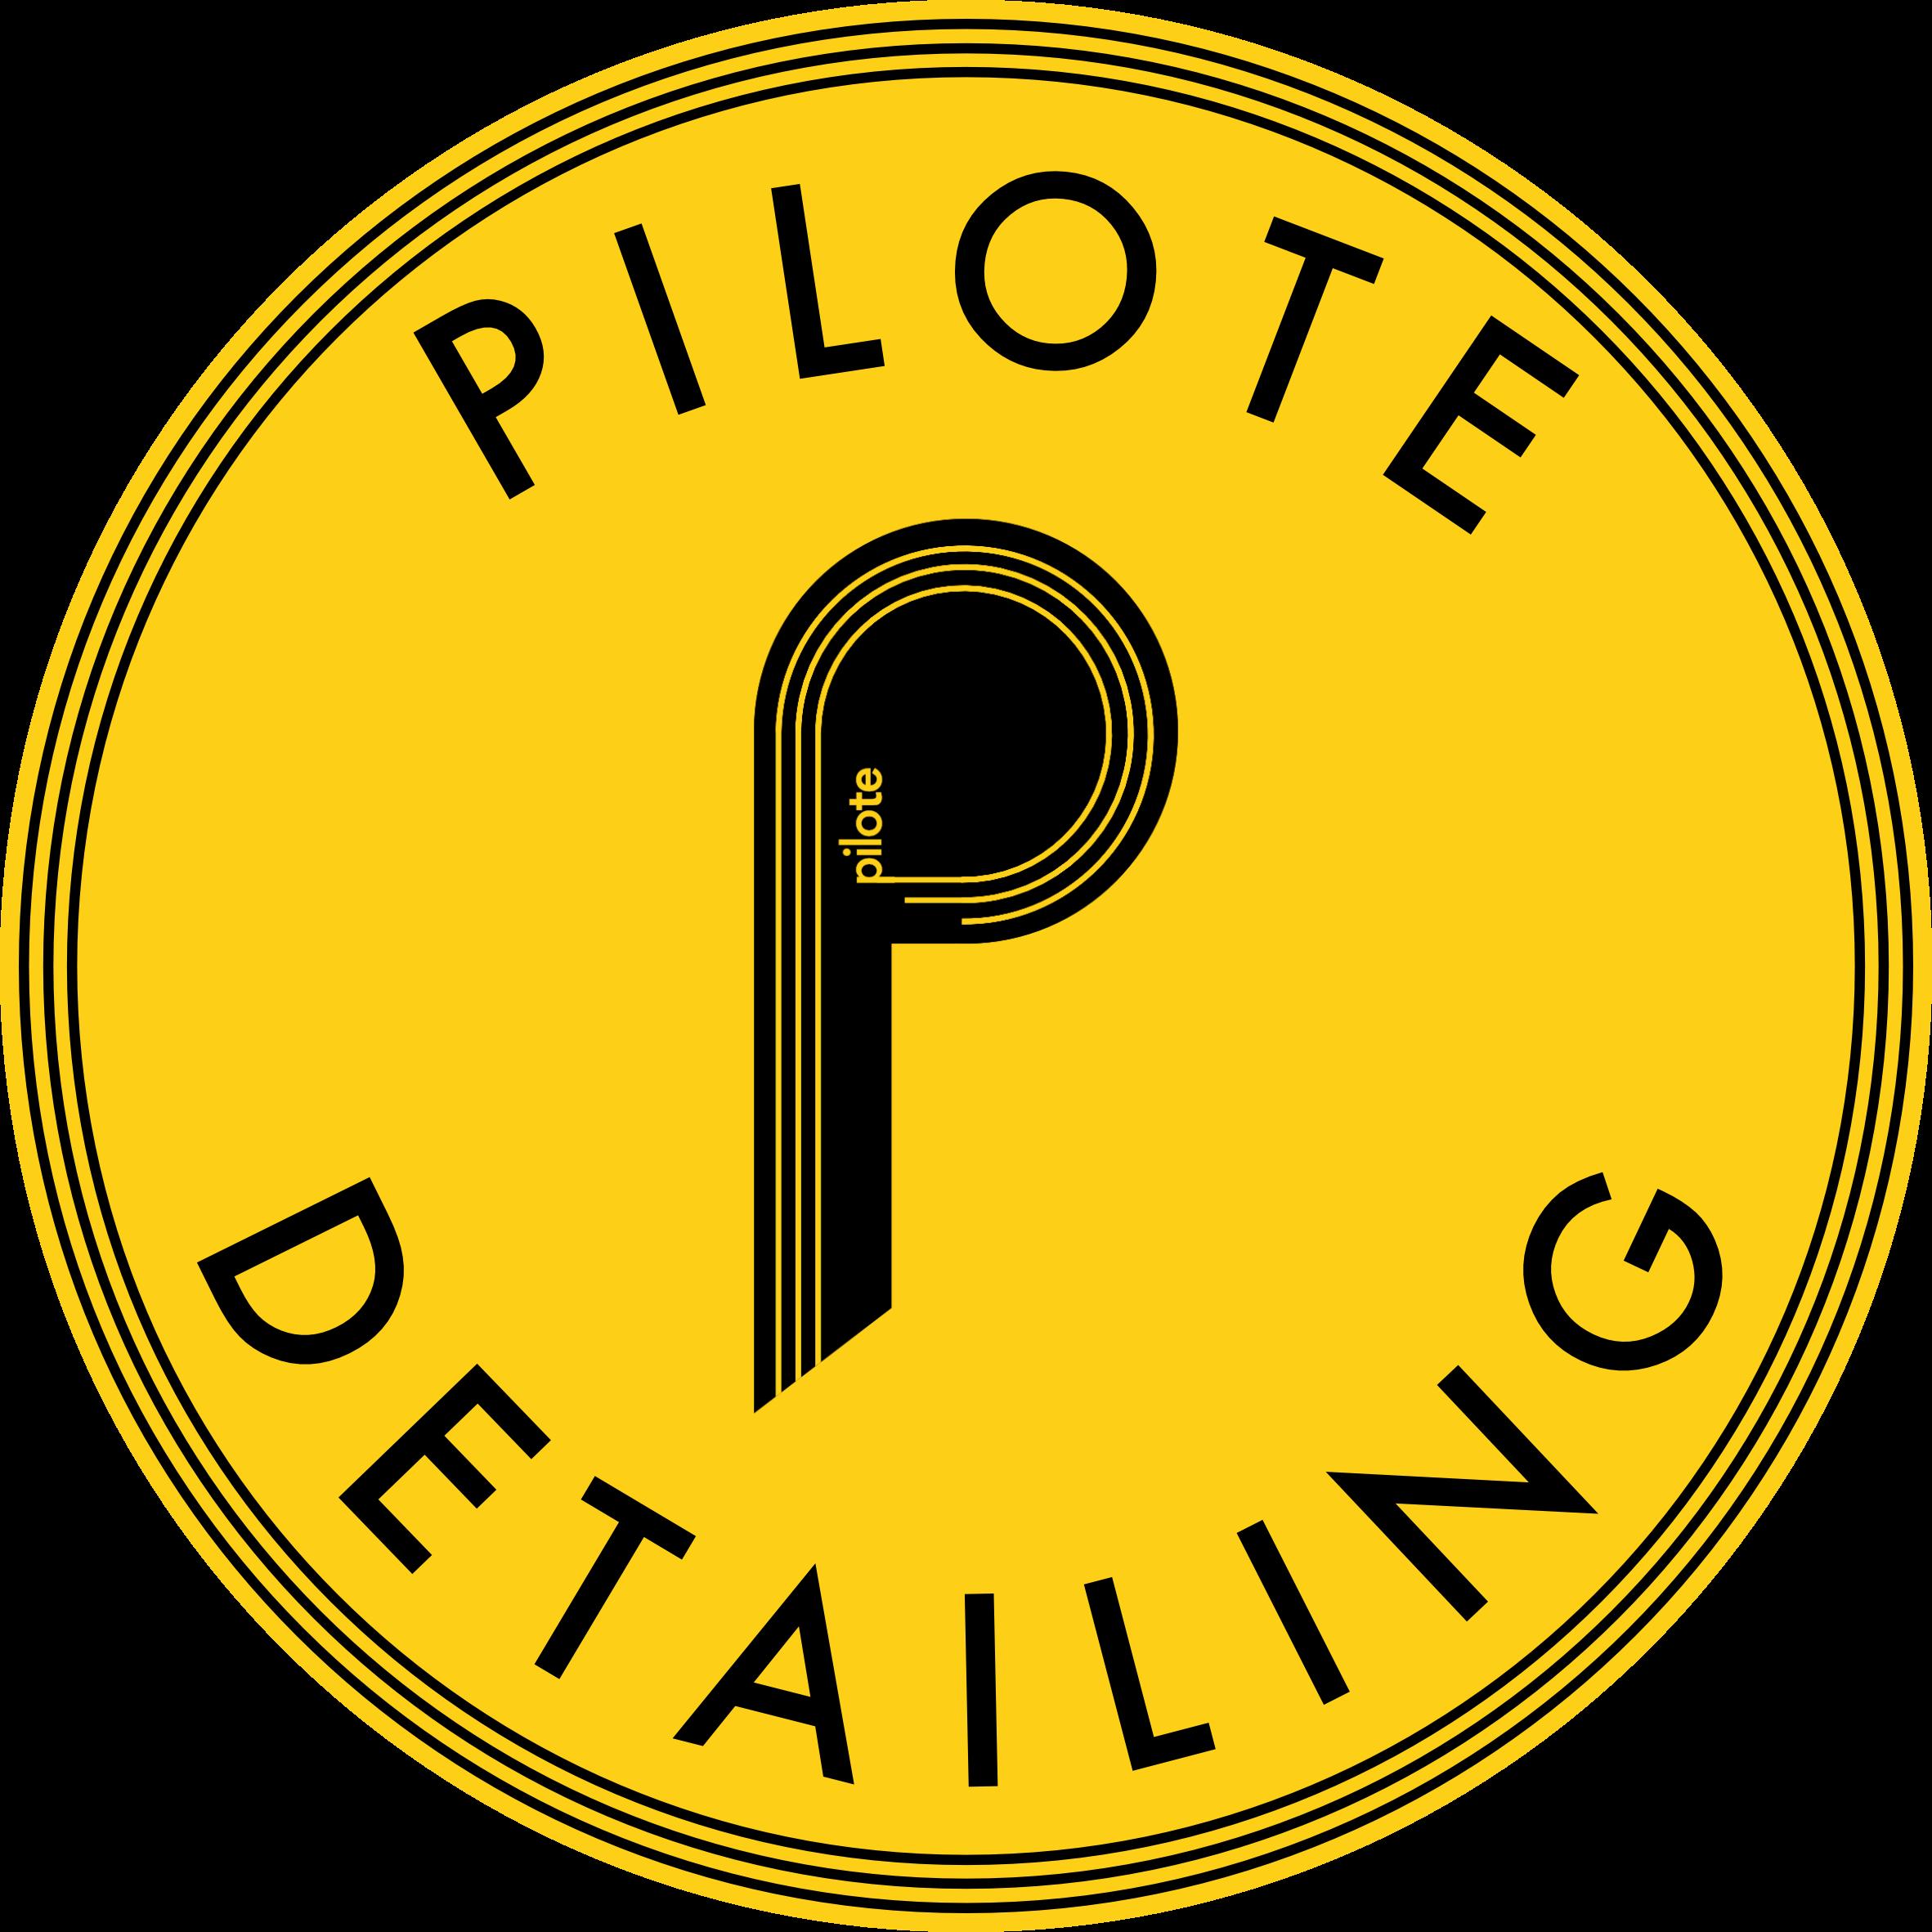 Detailing - Pilote Classics Ltd